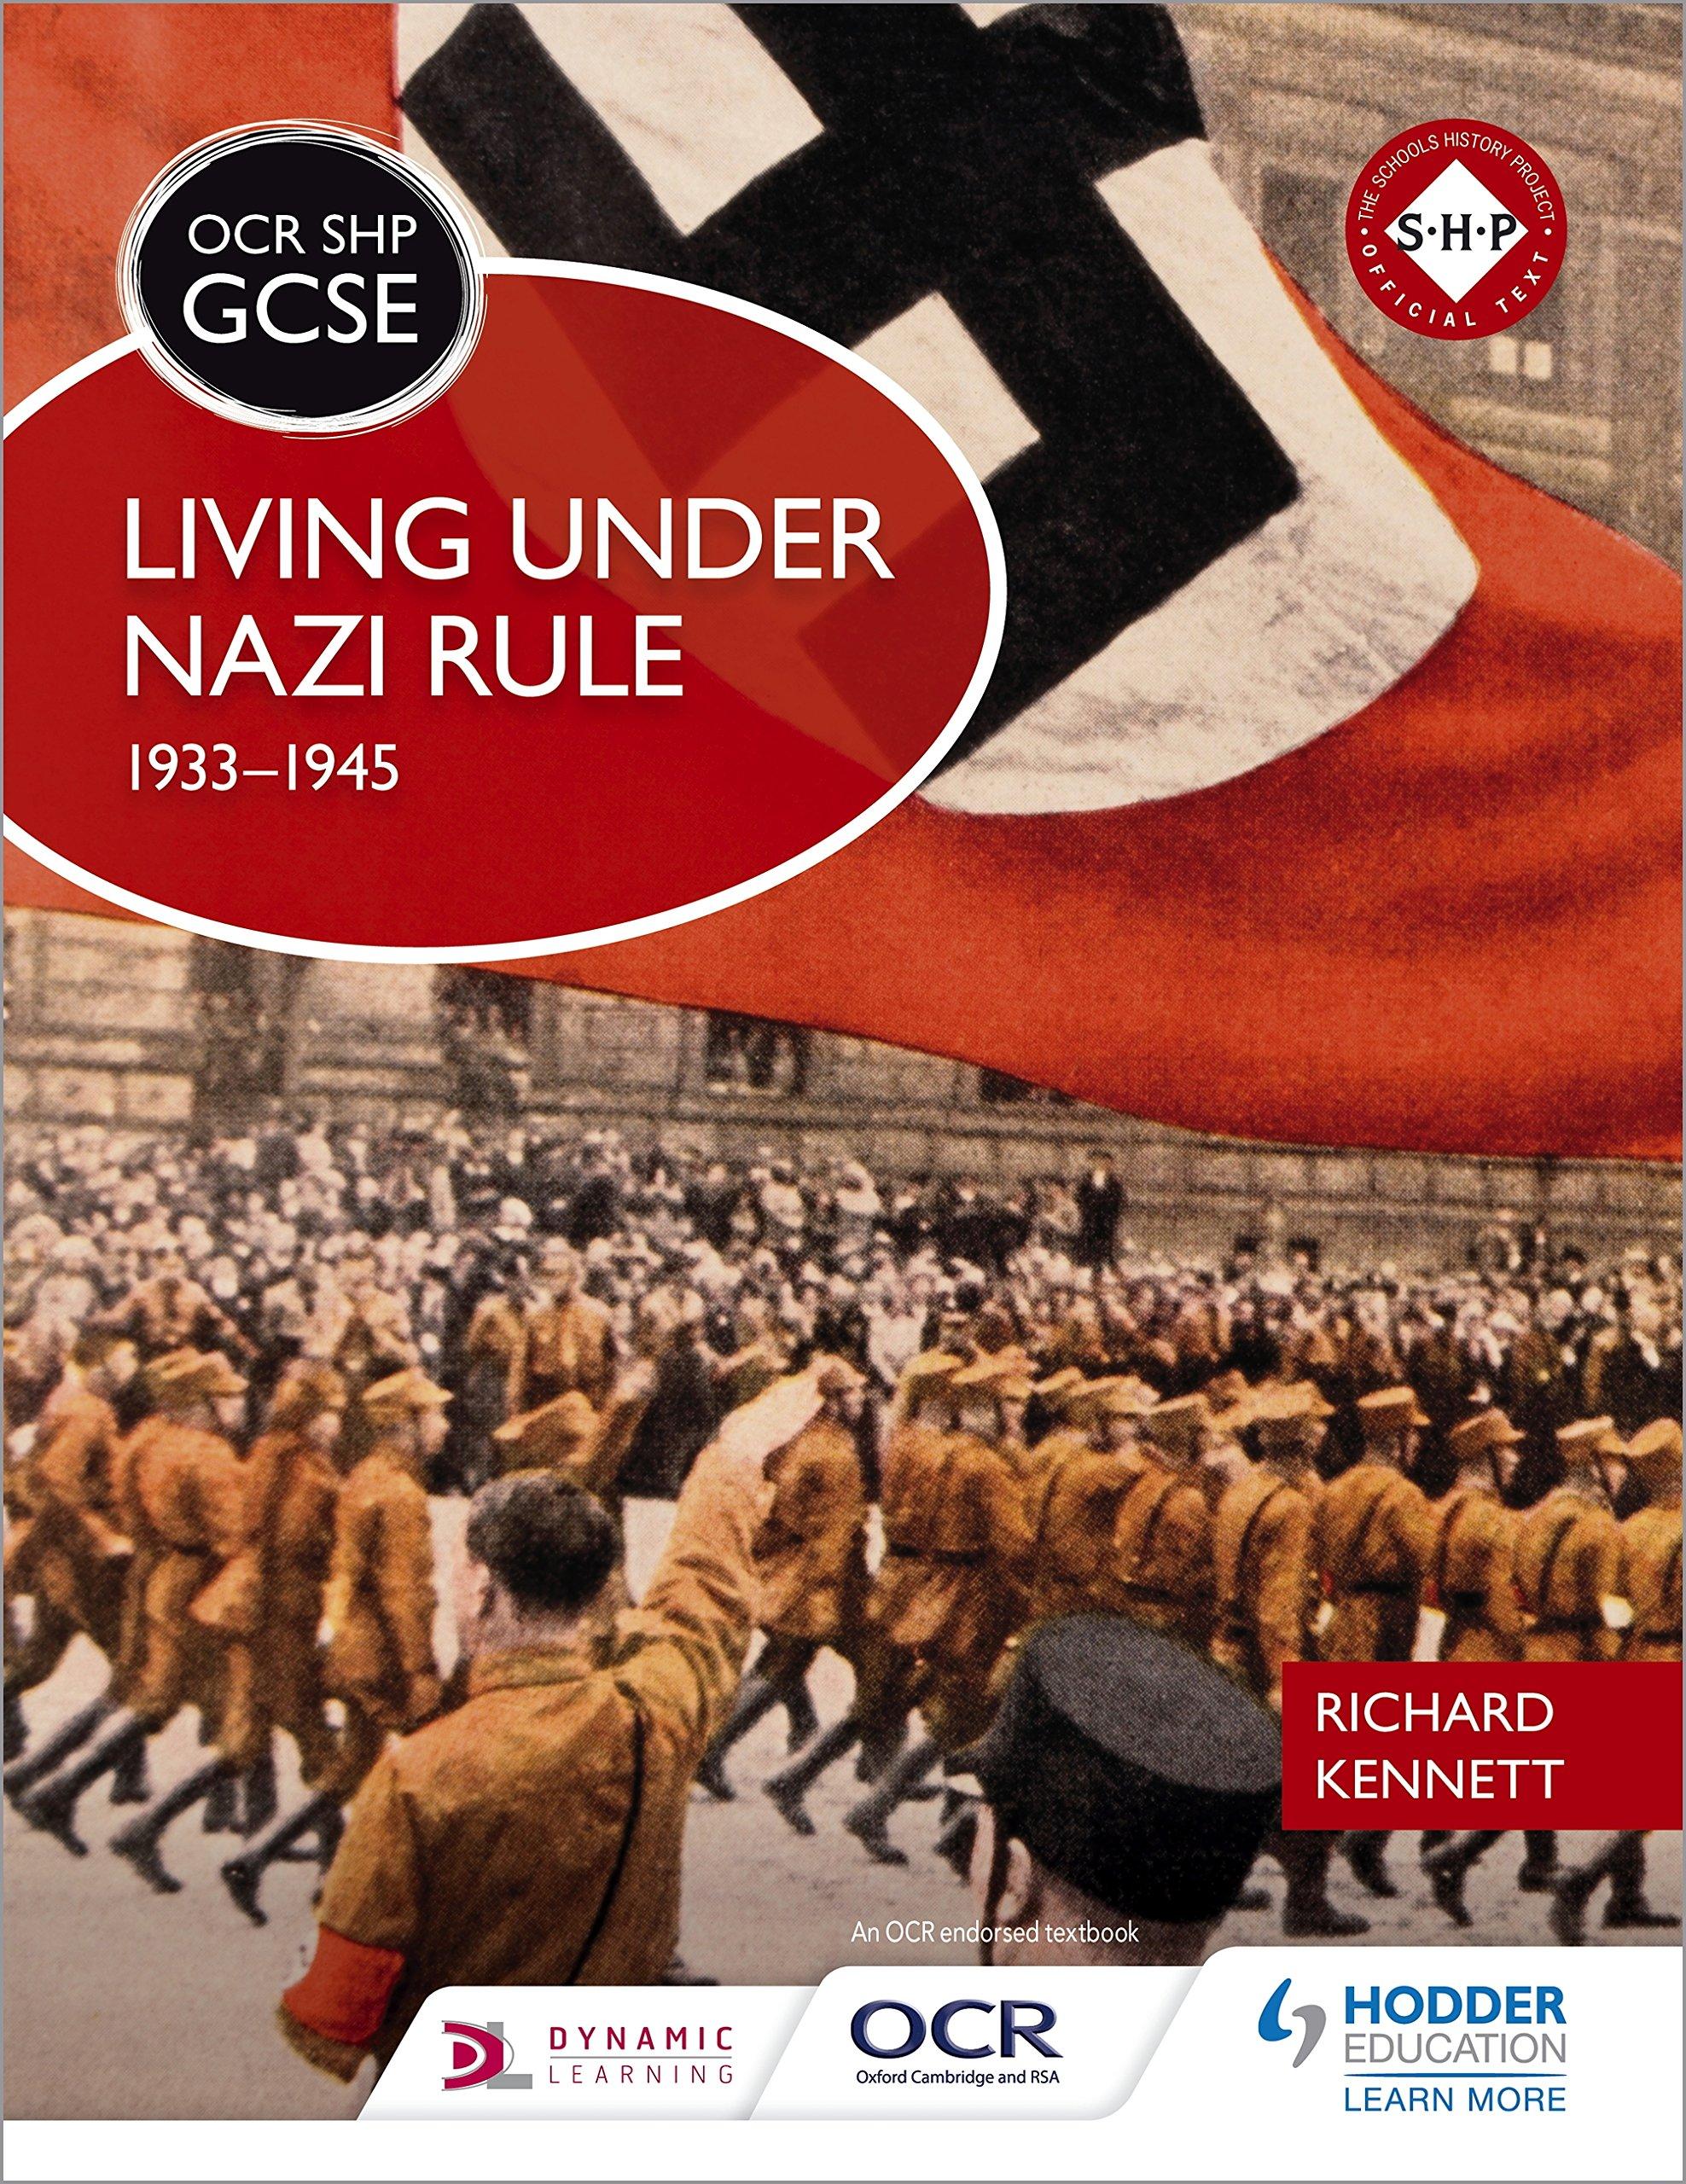 OCR GCSE History SHP  Living Under Nazi Rule 1933 1945  English Edition